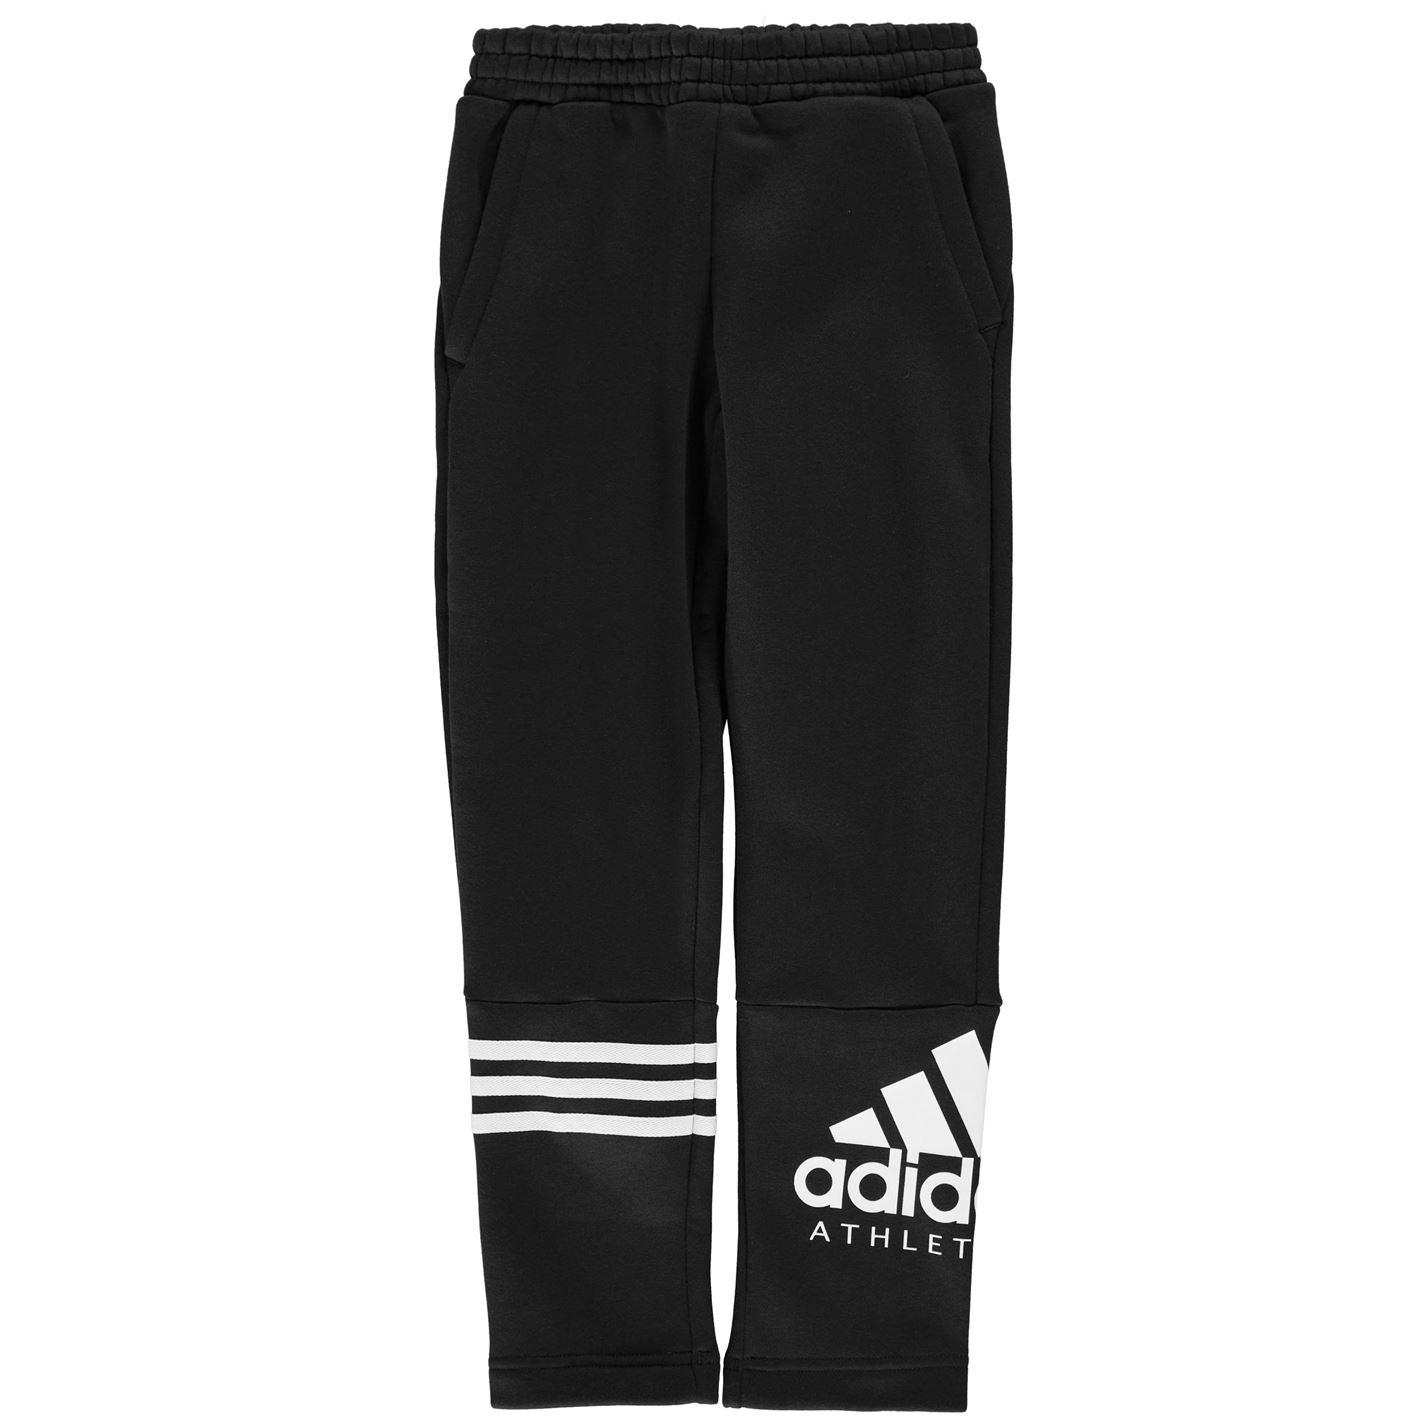 Adidas SID Fleece Pants Junior Boys